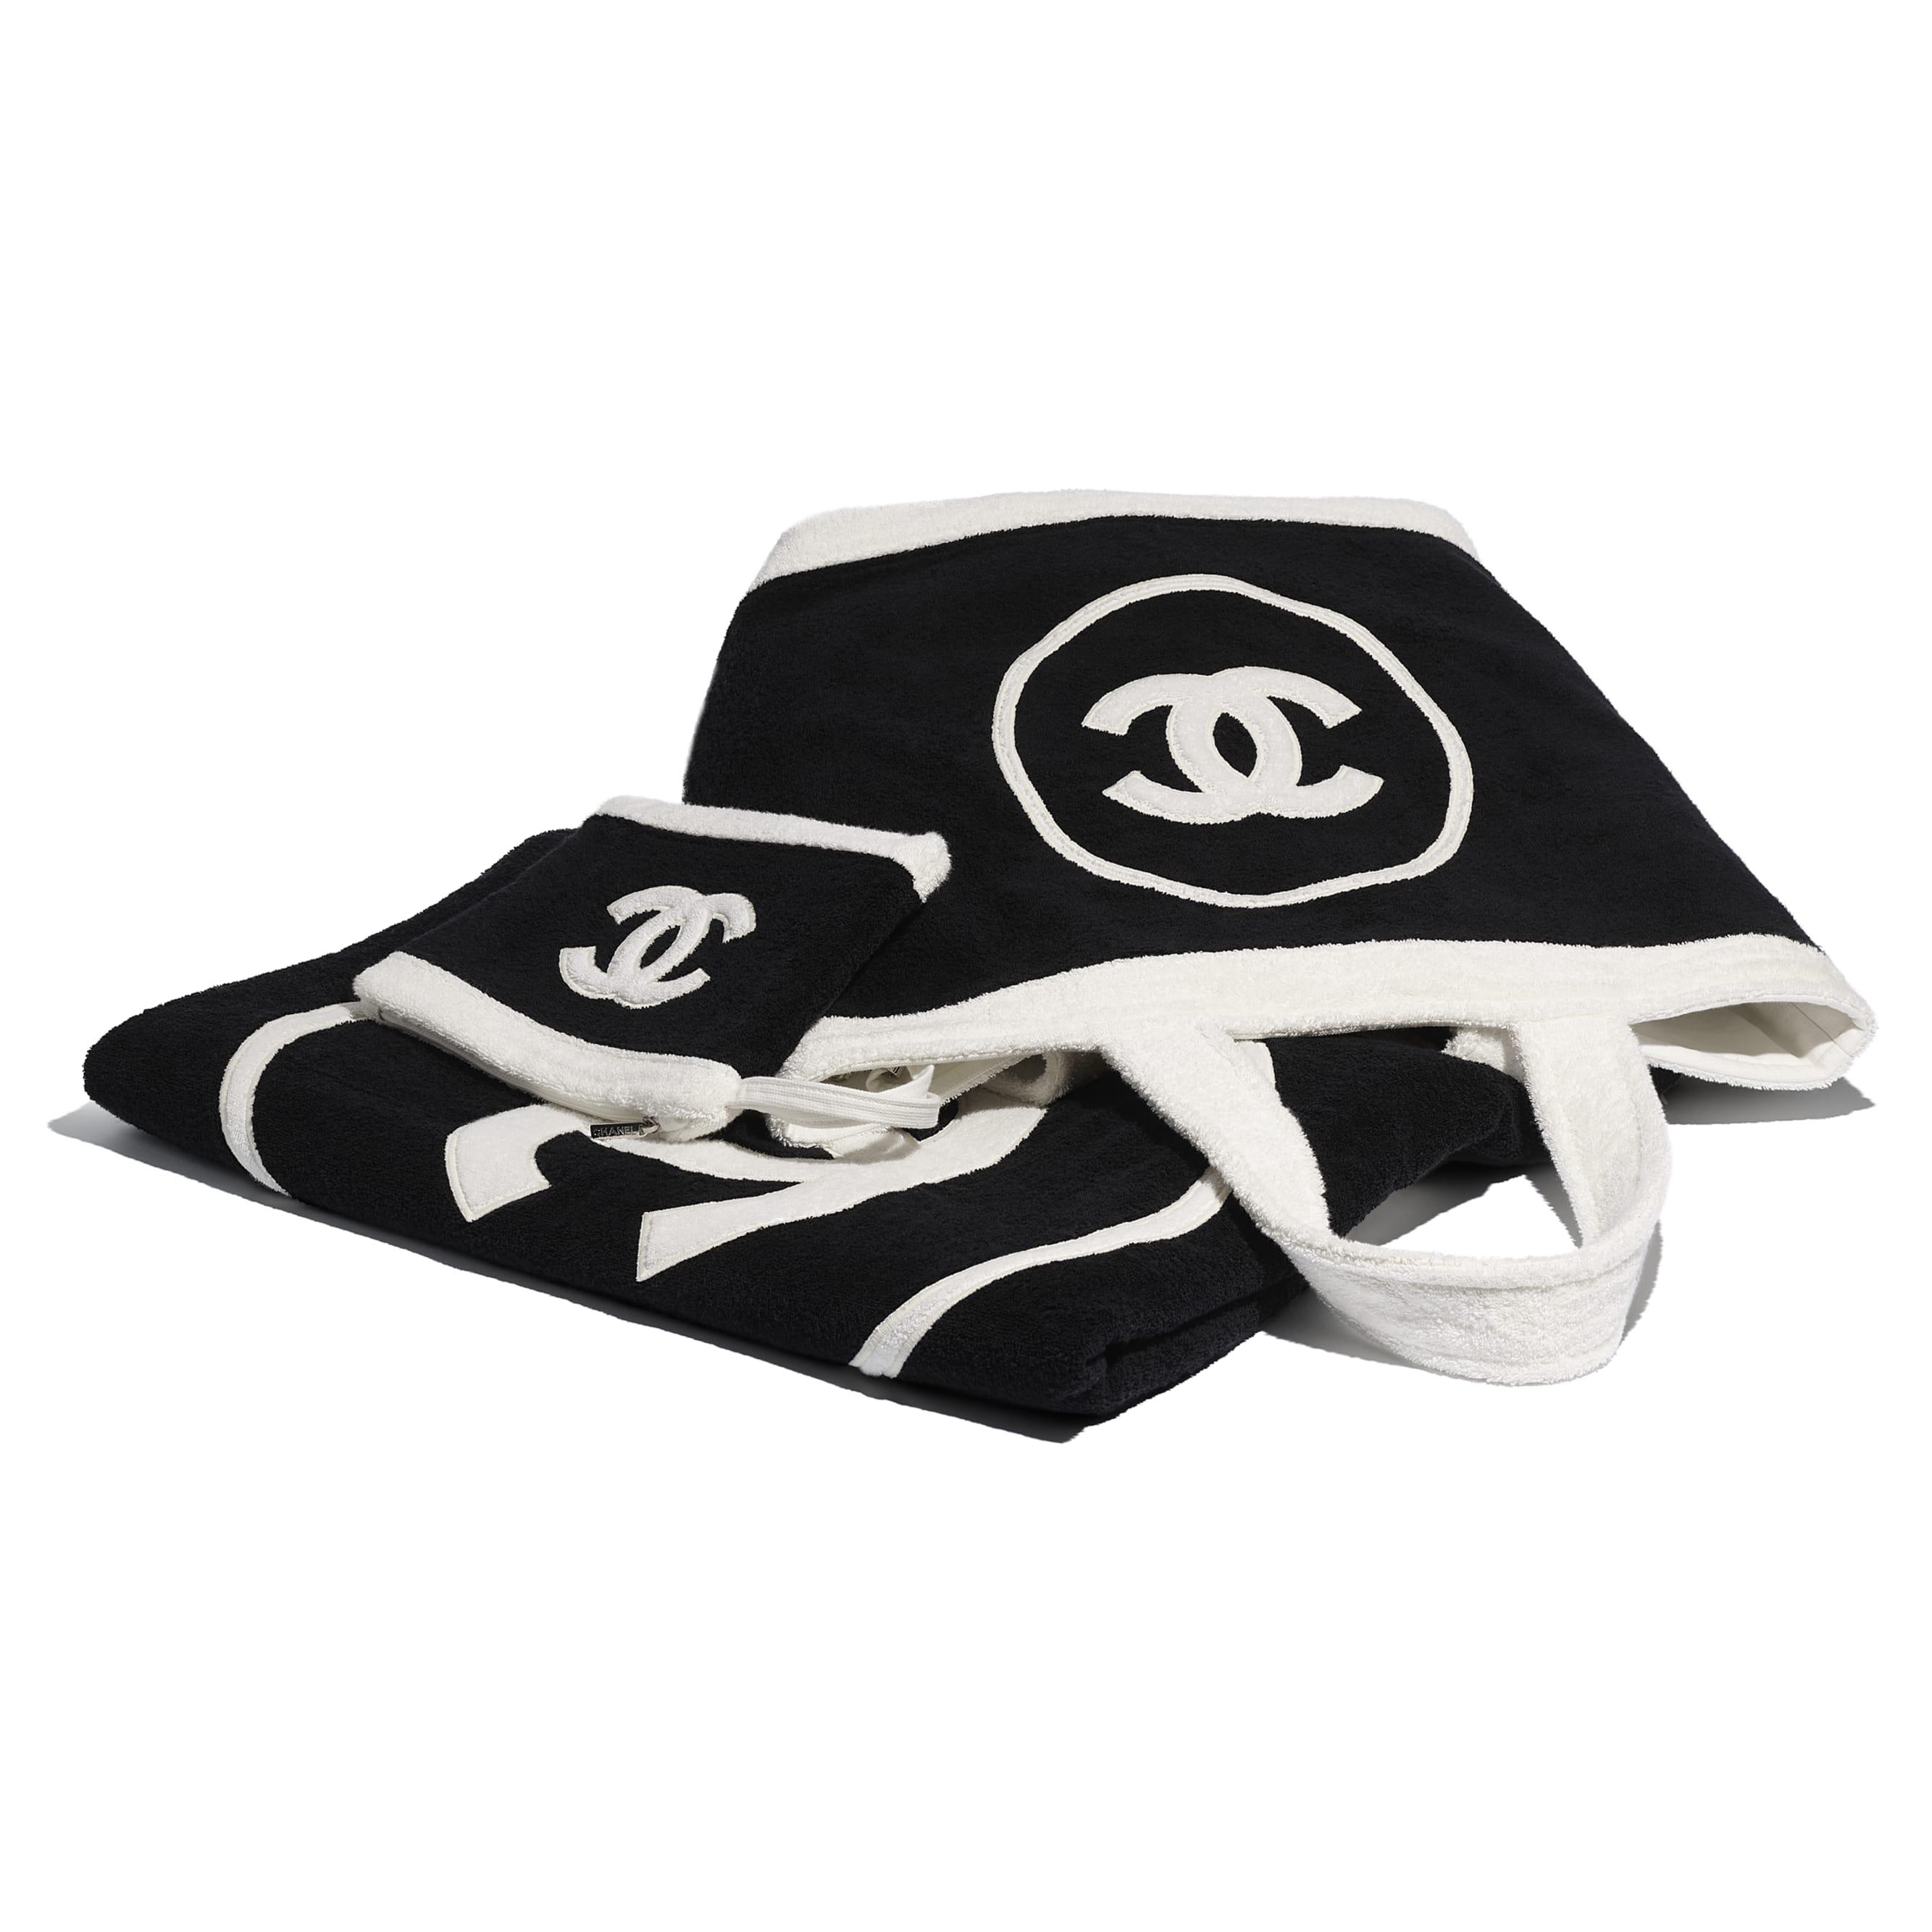 Beachwear Set - Black & White - Cotton - CHANEL - Alternative view - see standard sized version